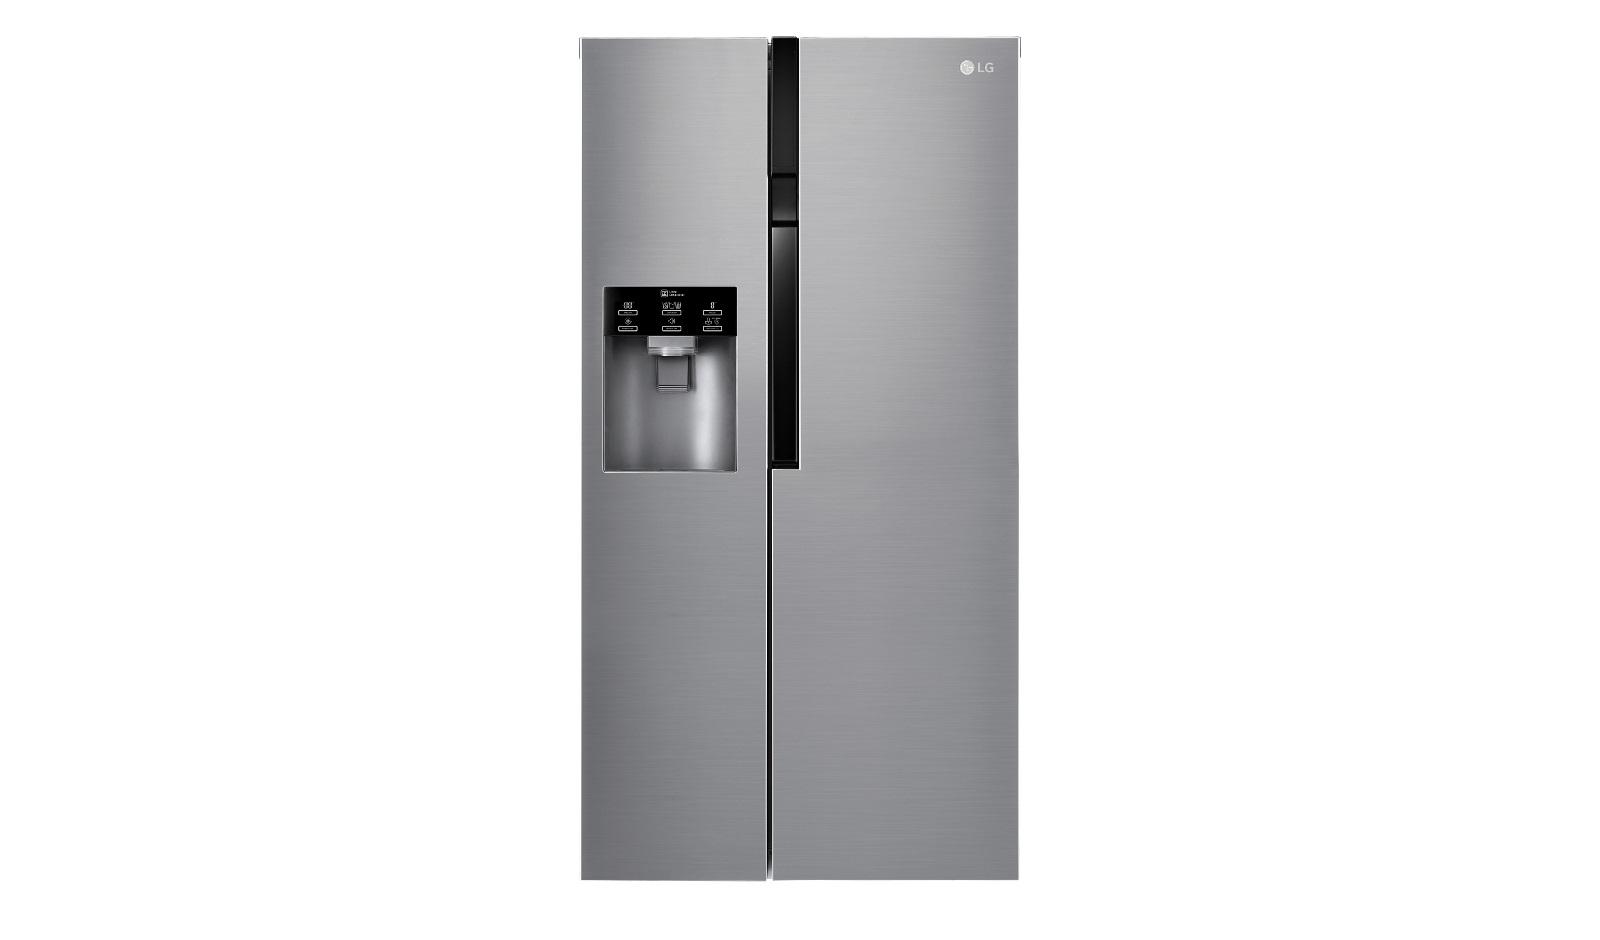 LG GSL560PZXV American Fridge Freezer